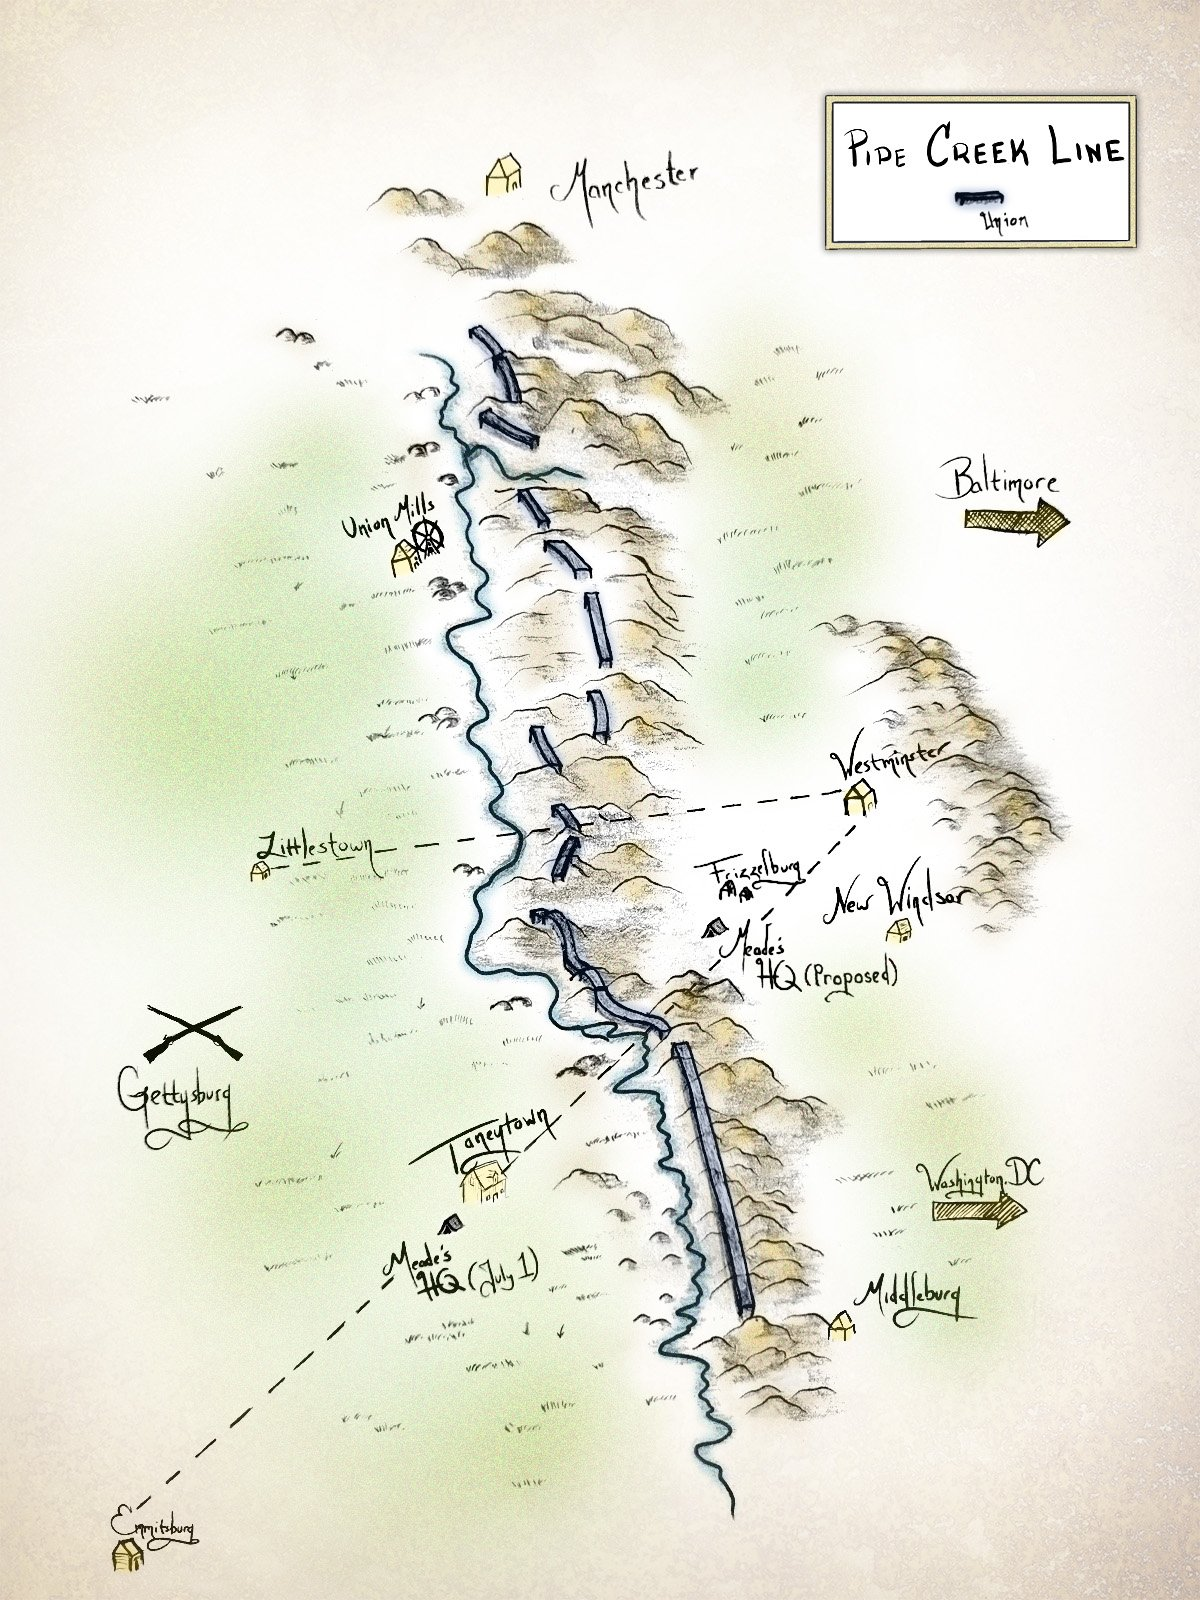 Pipe Creek Line